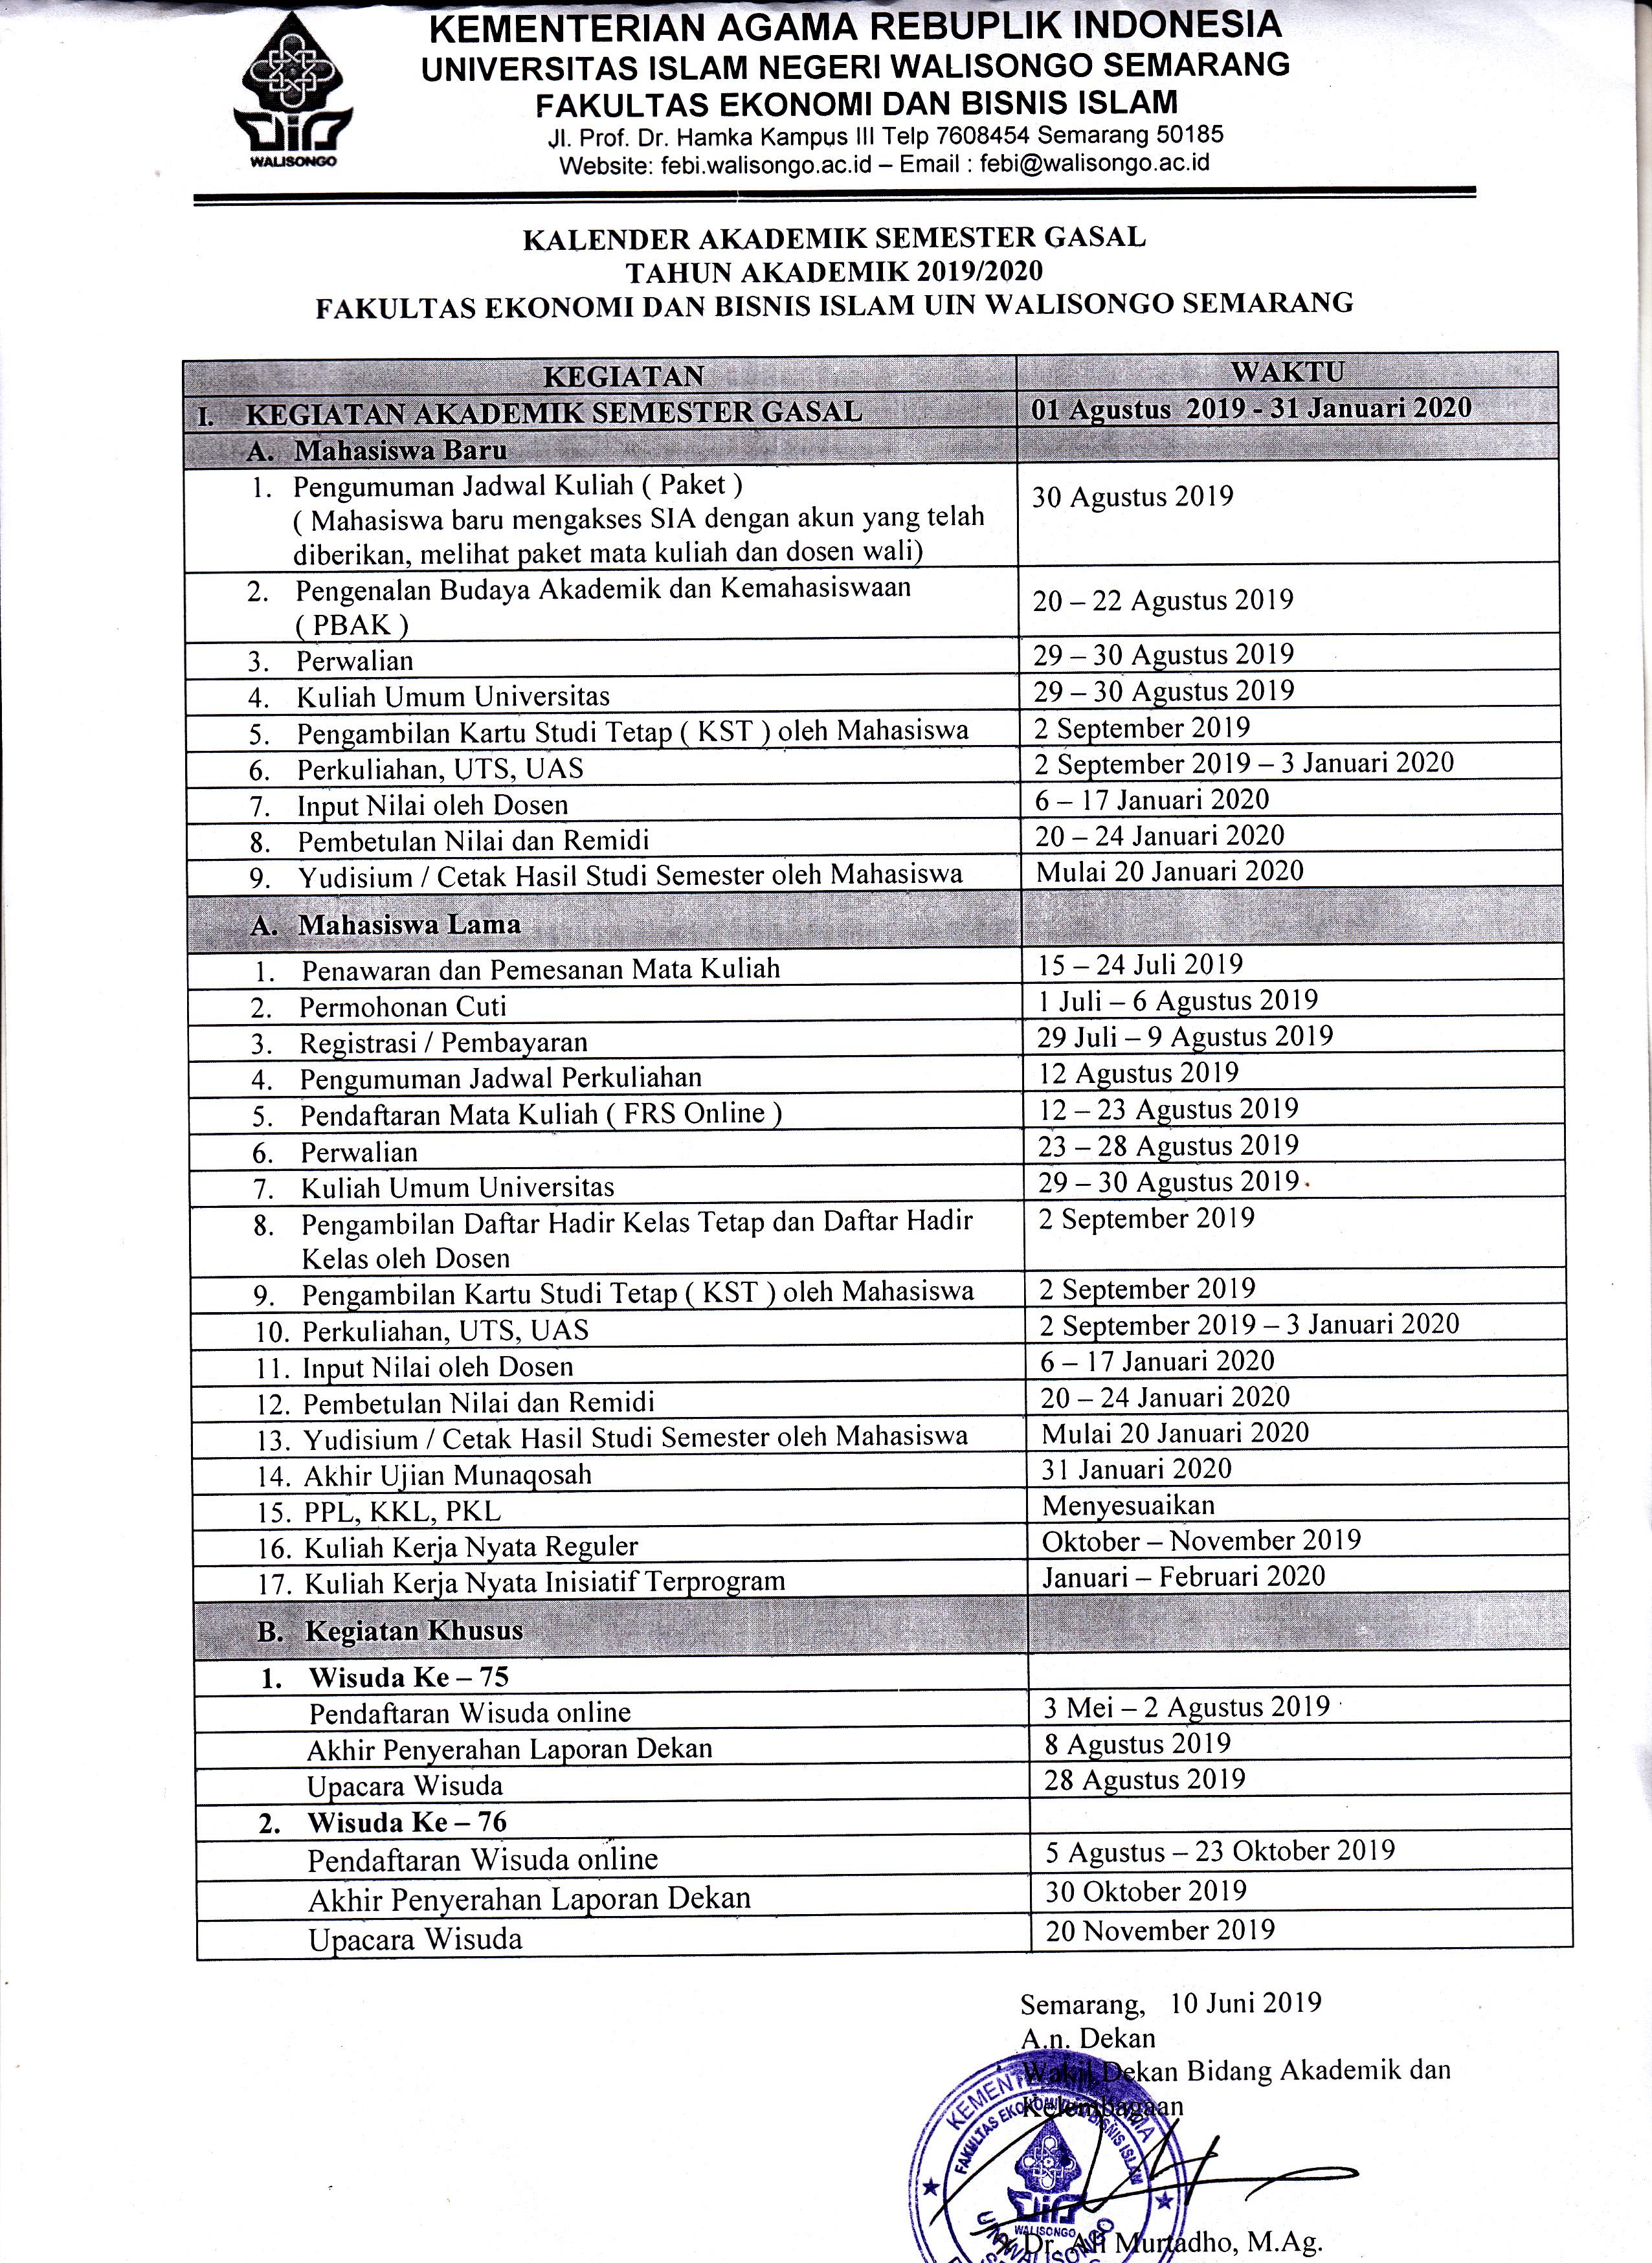 Kalender Akademik Semester Gasal T.A 2019/2020 FEBI UIN Walisongo Semarang